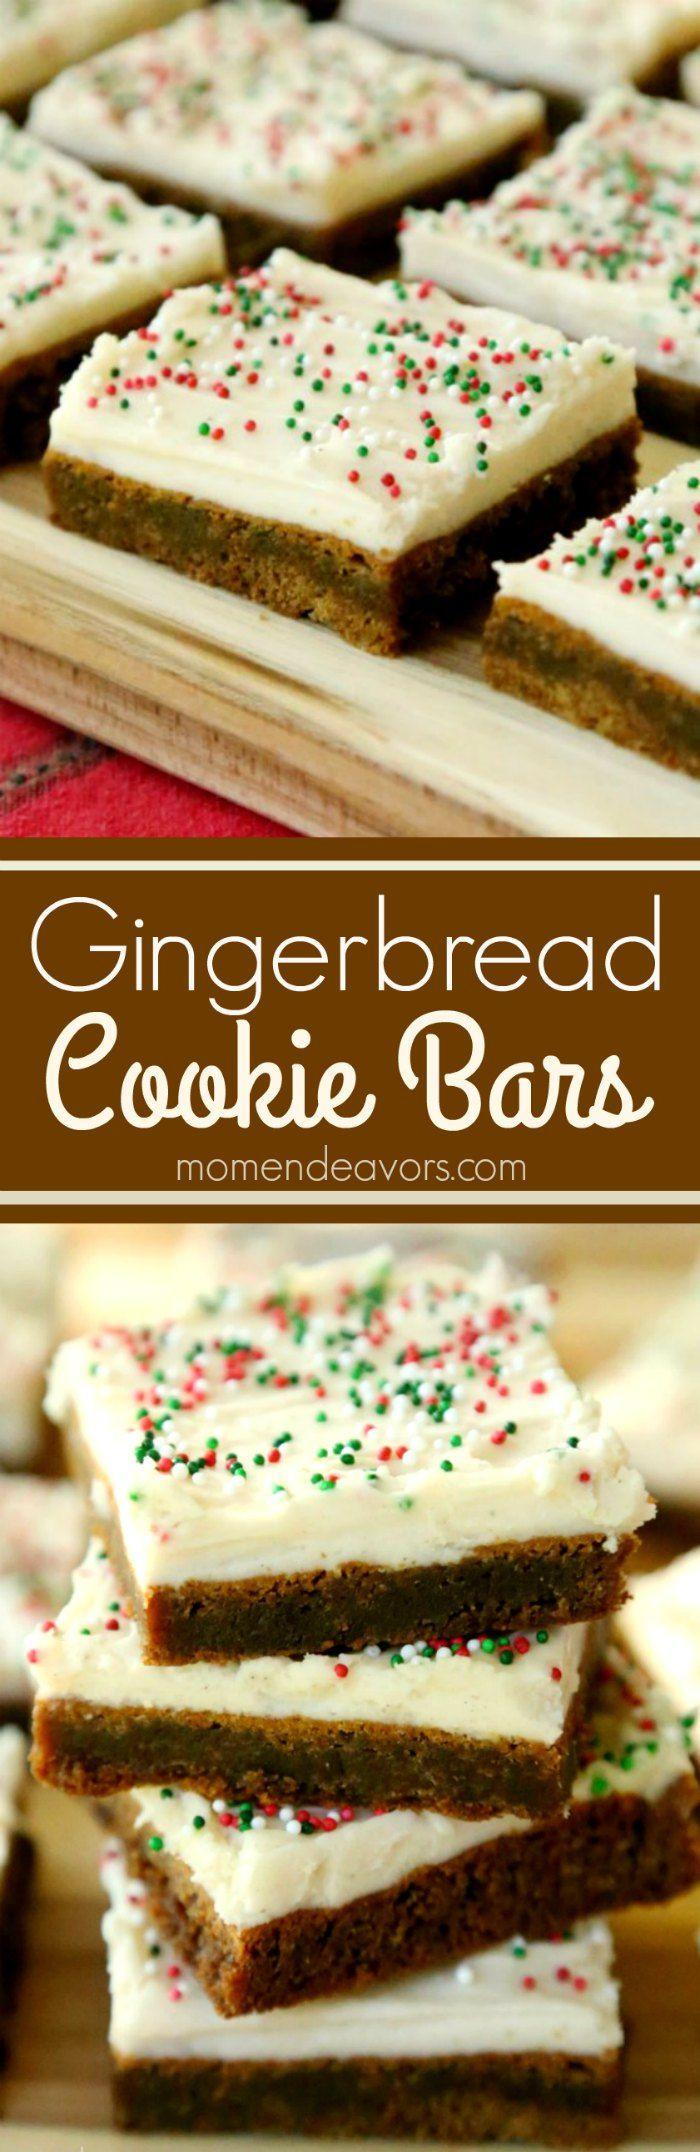 Christmas Desserts Pinterest  Best 25 Christmas desserts ideas on Pinterest